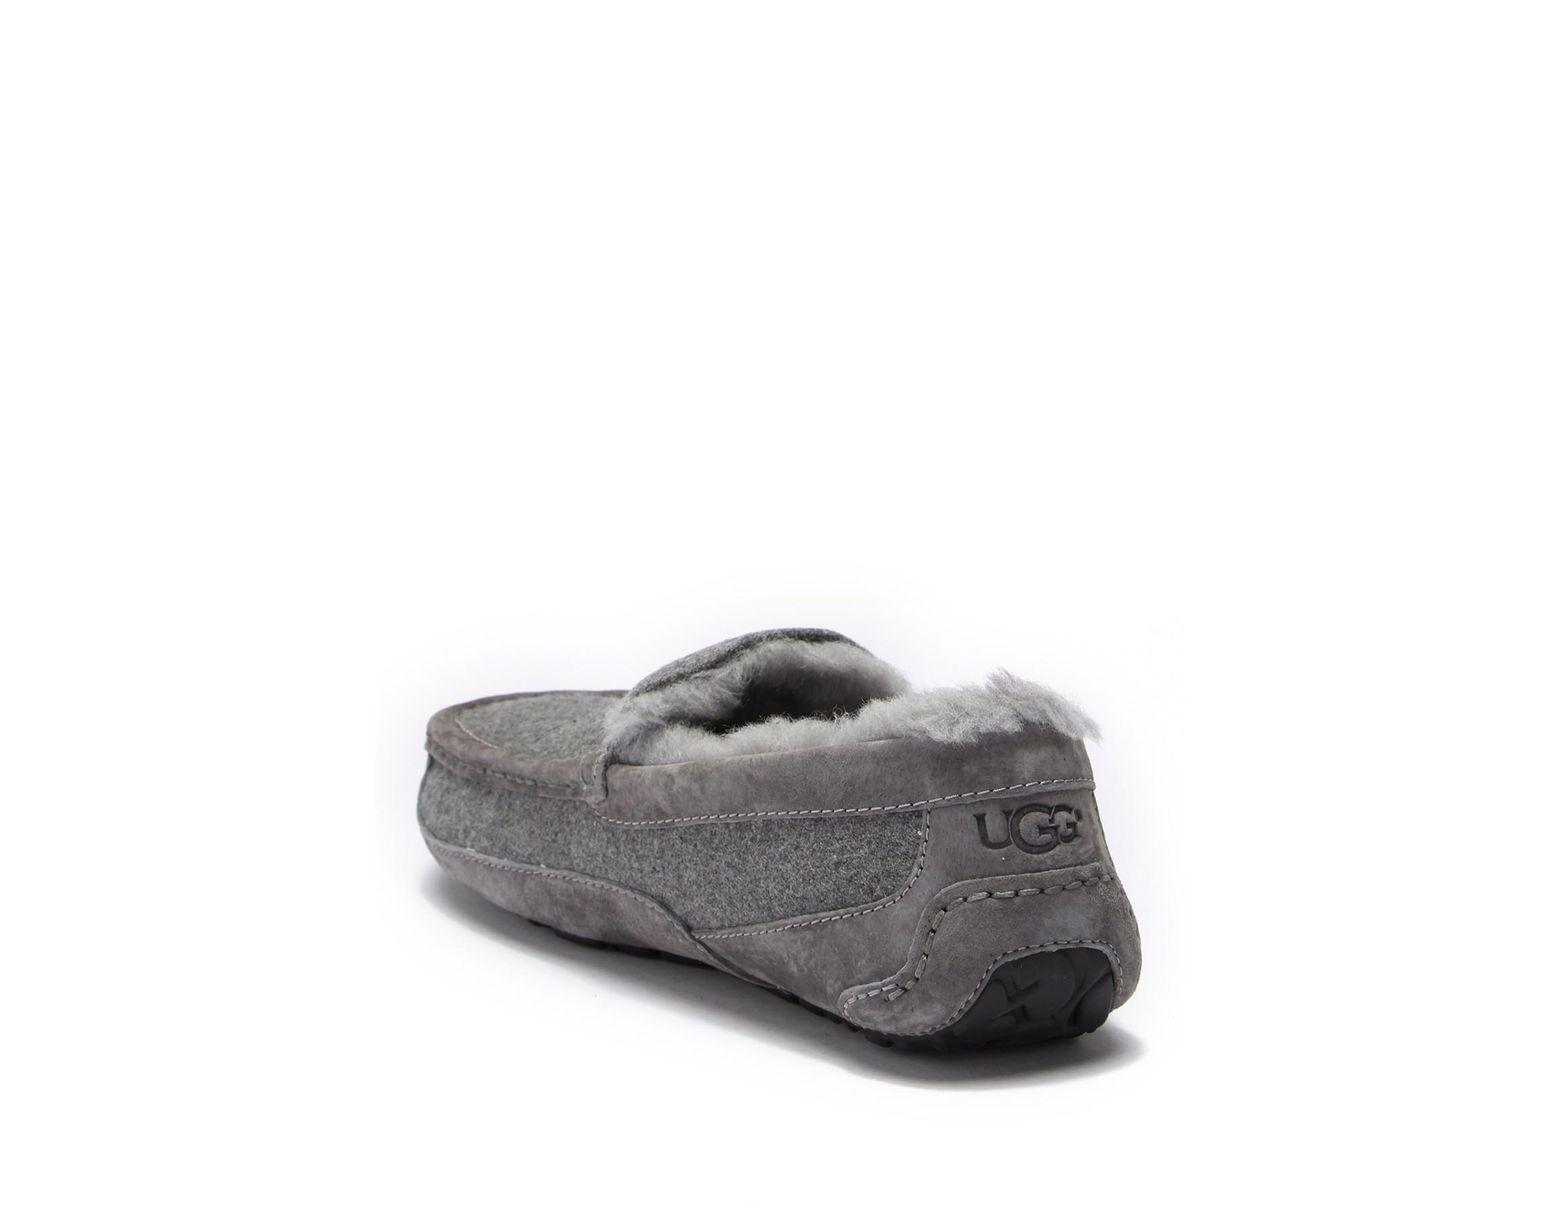 00bc82a7c31 Men's Gray Ascot Uggpure(tm) Slipper